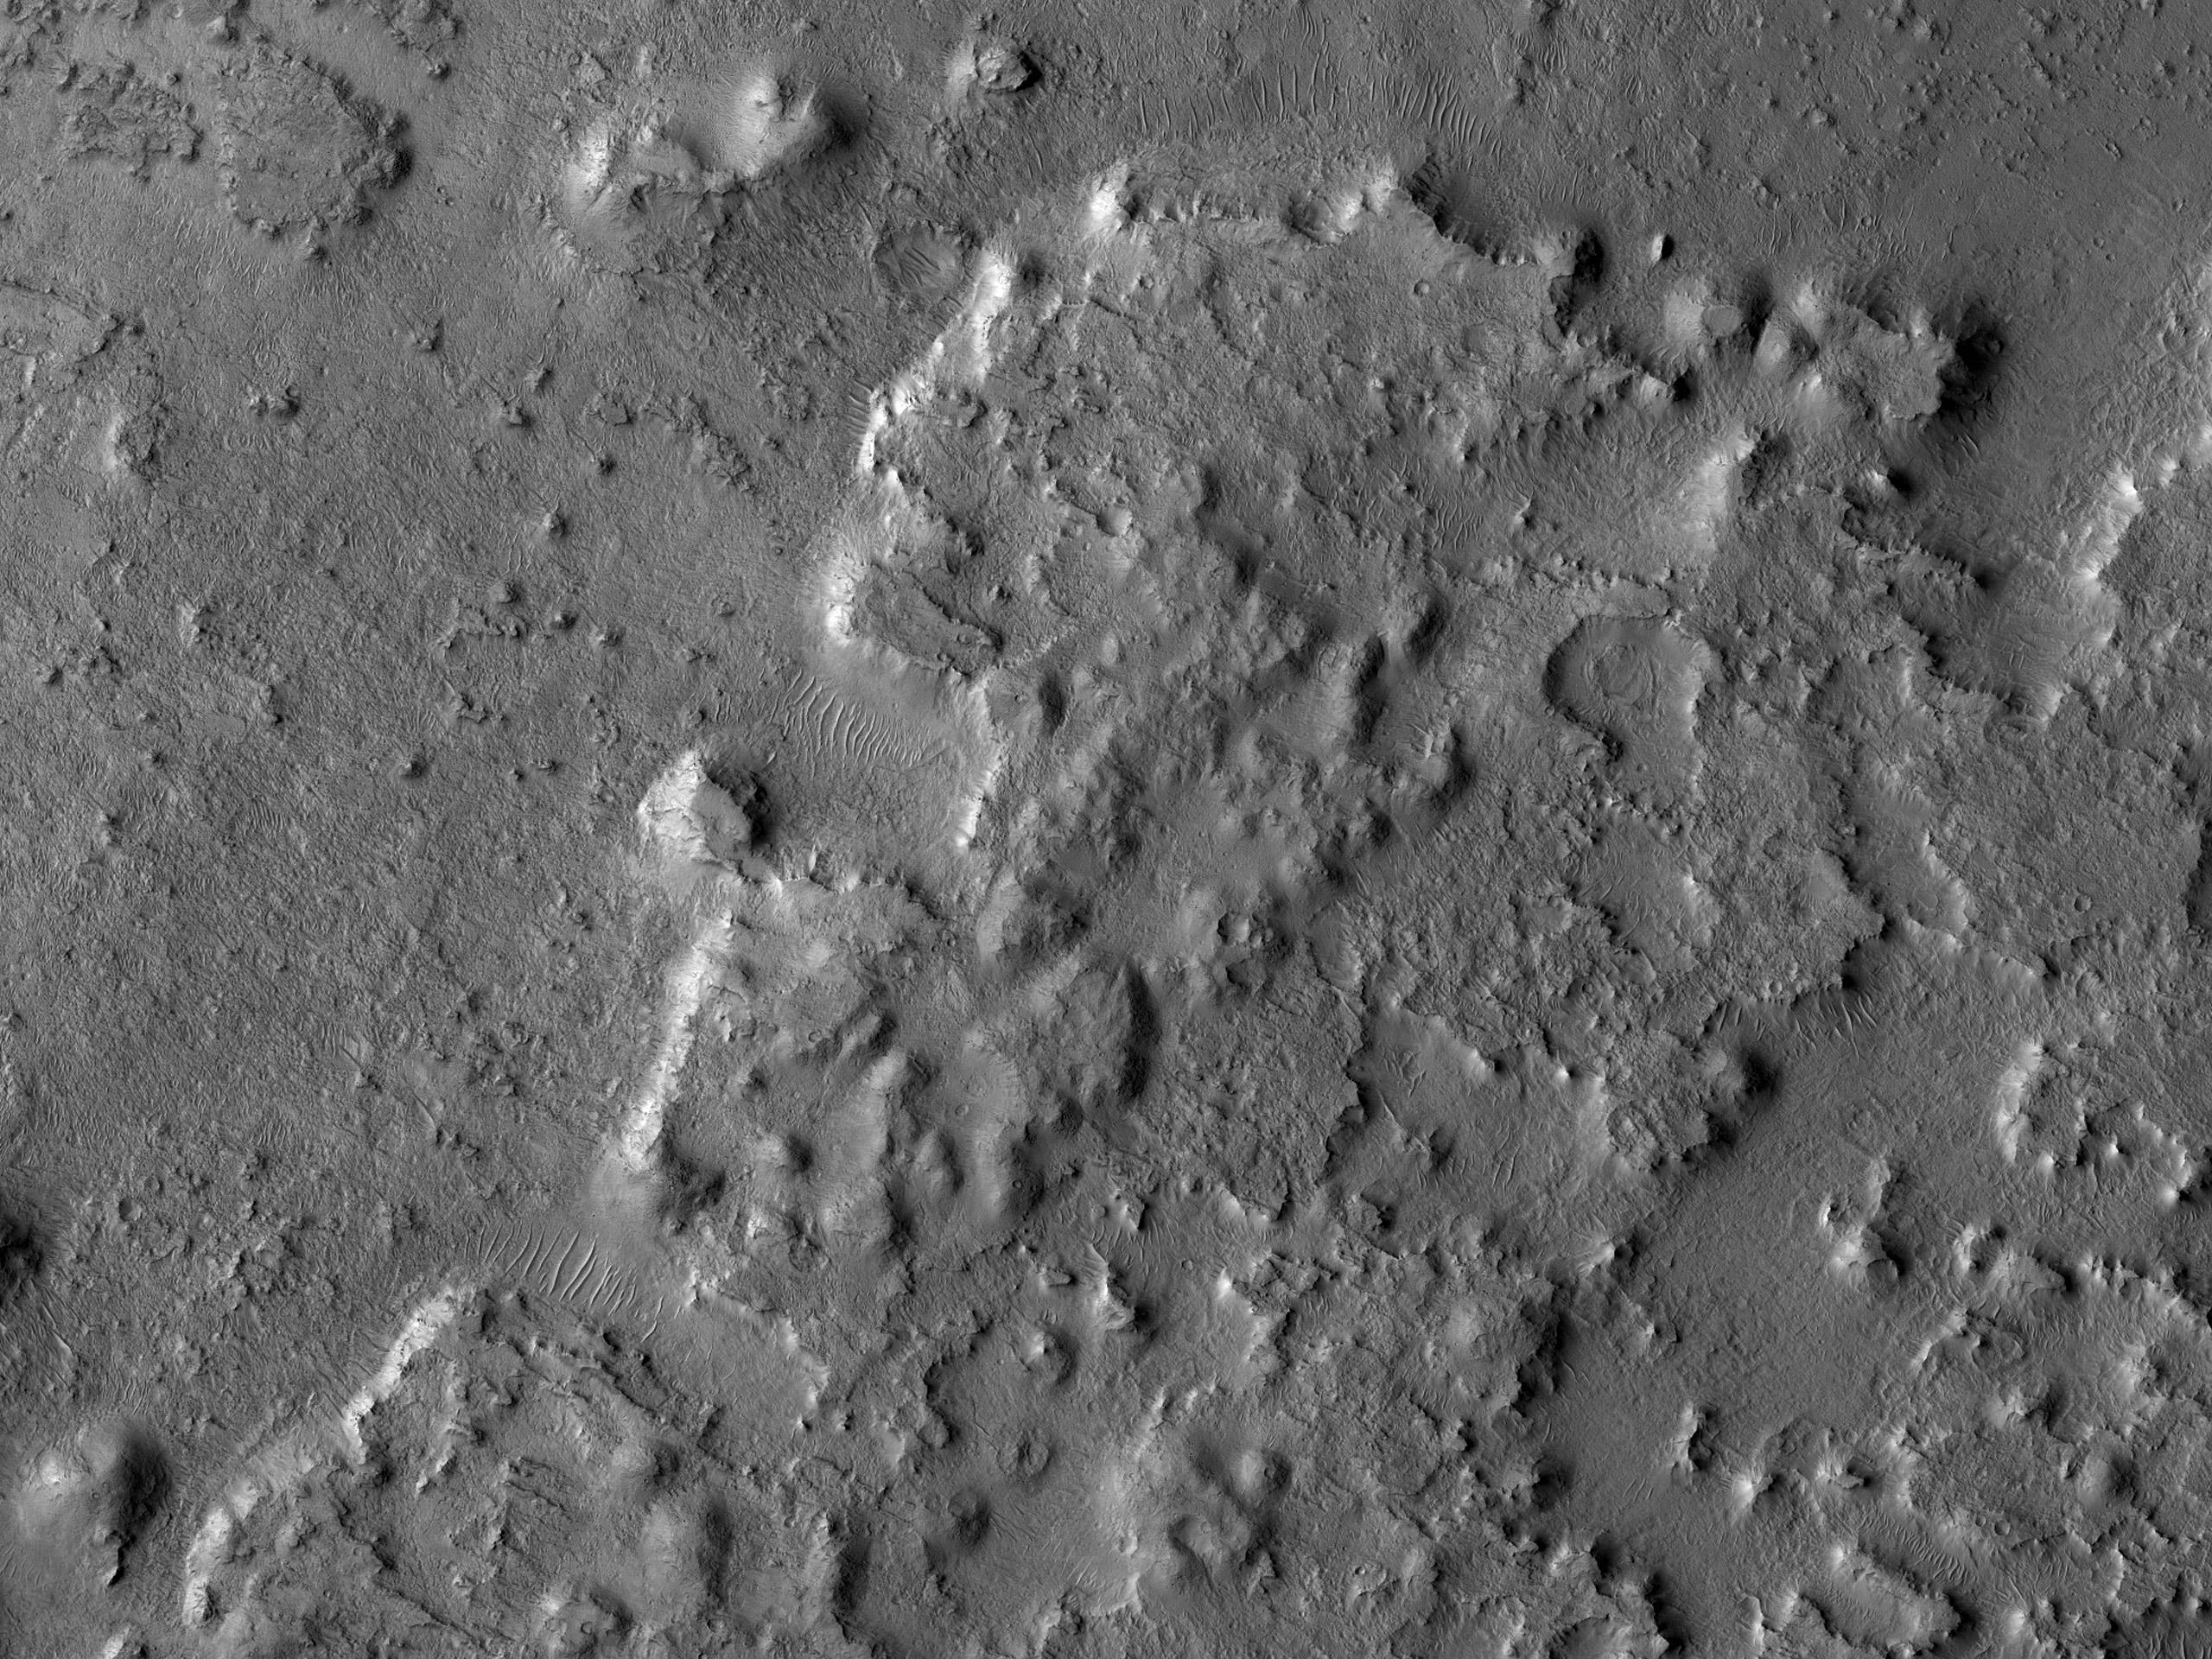 Possible Clays in Arabia Terra